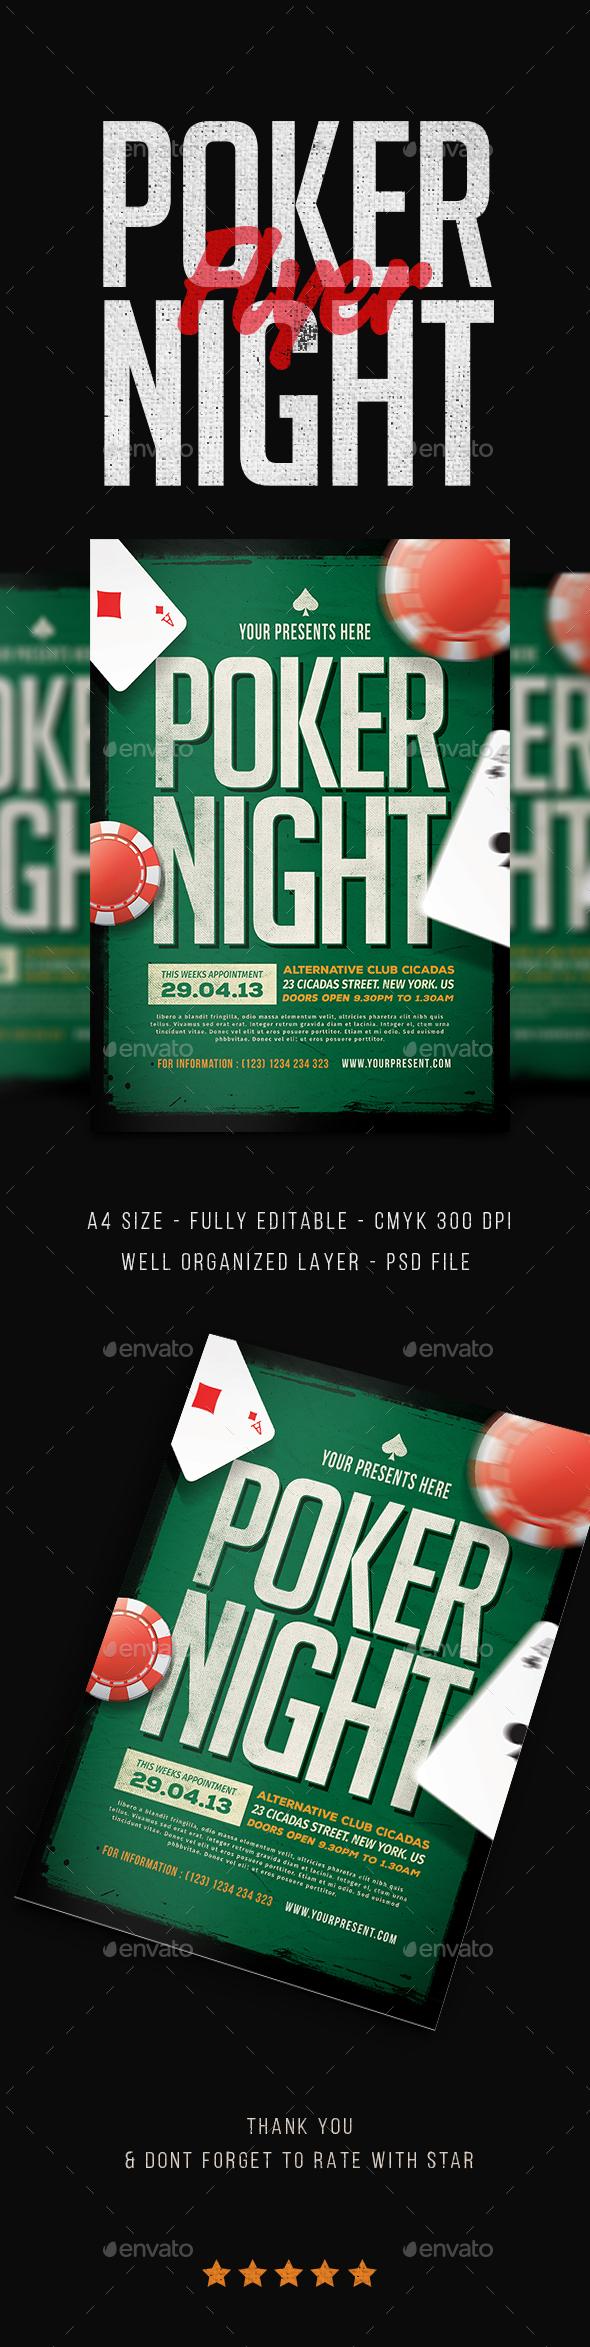 Poker Night Flyer - Events Flyers